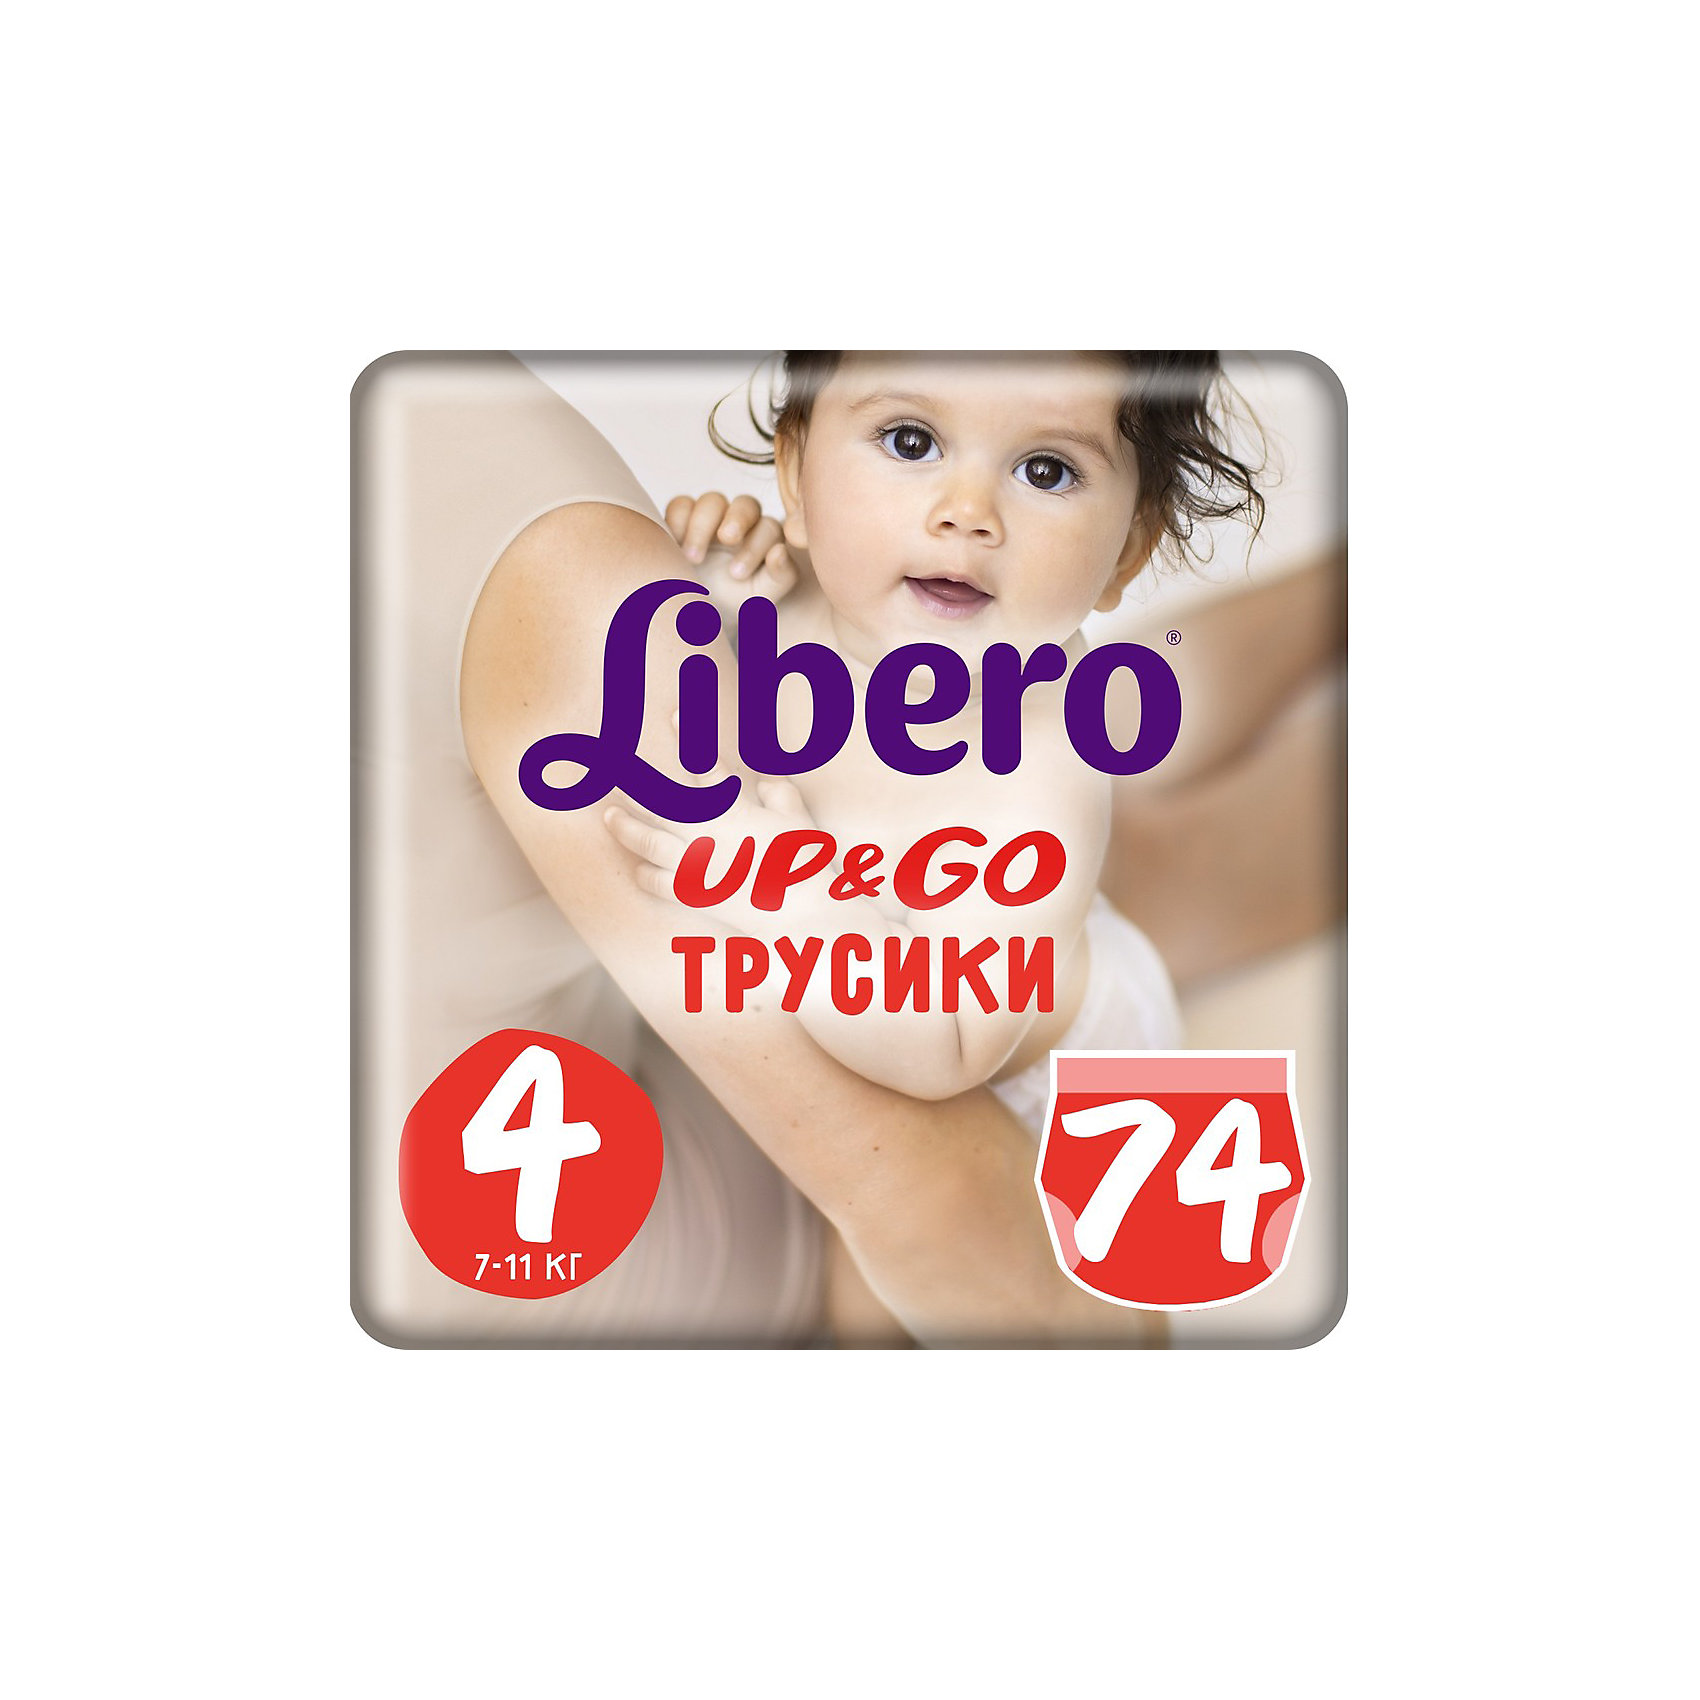 Libero Трусики Up&Go, Giga Maxi 7-11 кг (4), 74 шт., Libero libero подгузники трусики up